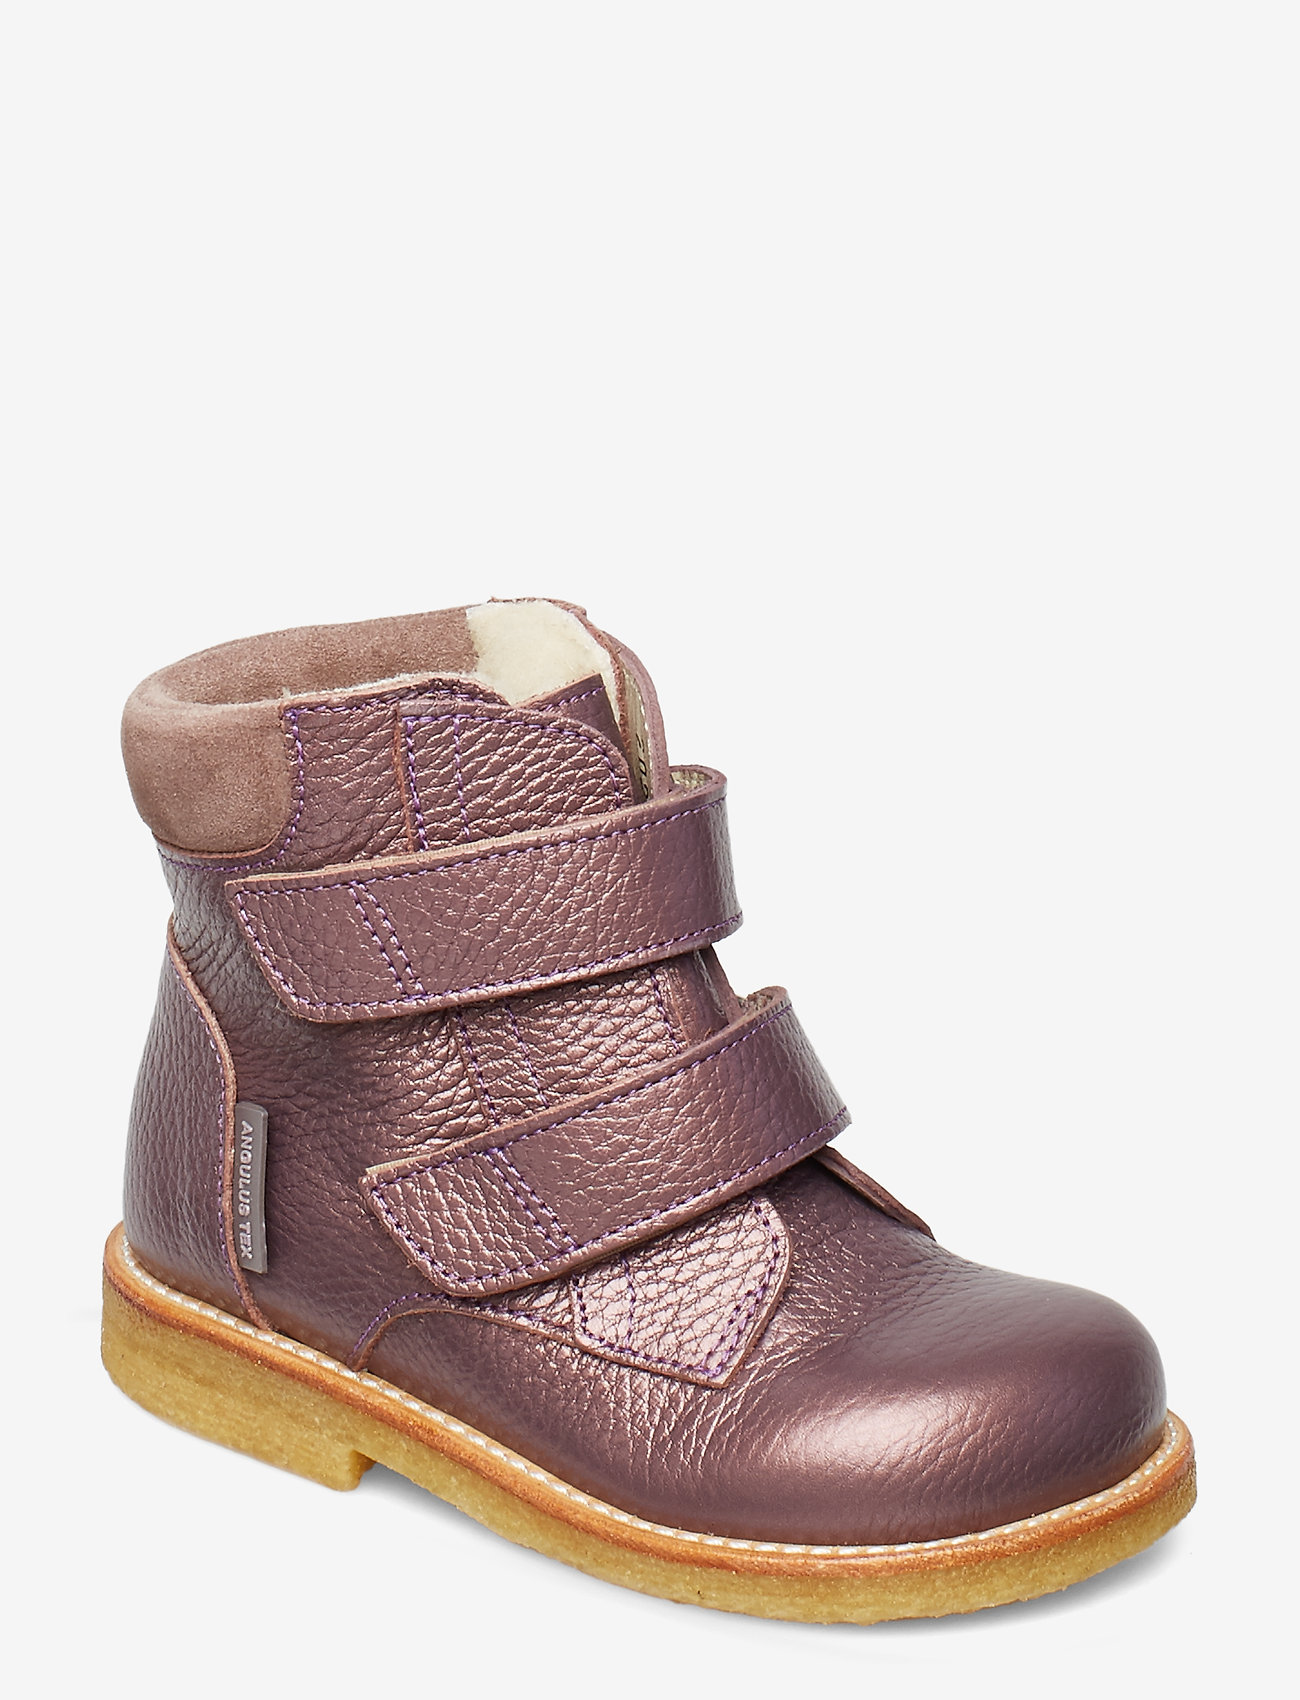 ANGULUS - Boots - flat - with velcro - lauflernschuhe - 1509/2202 lavender shine/laven - 0